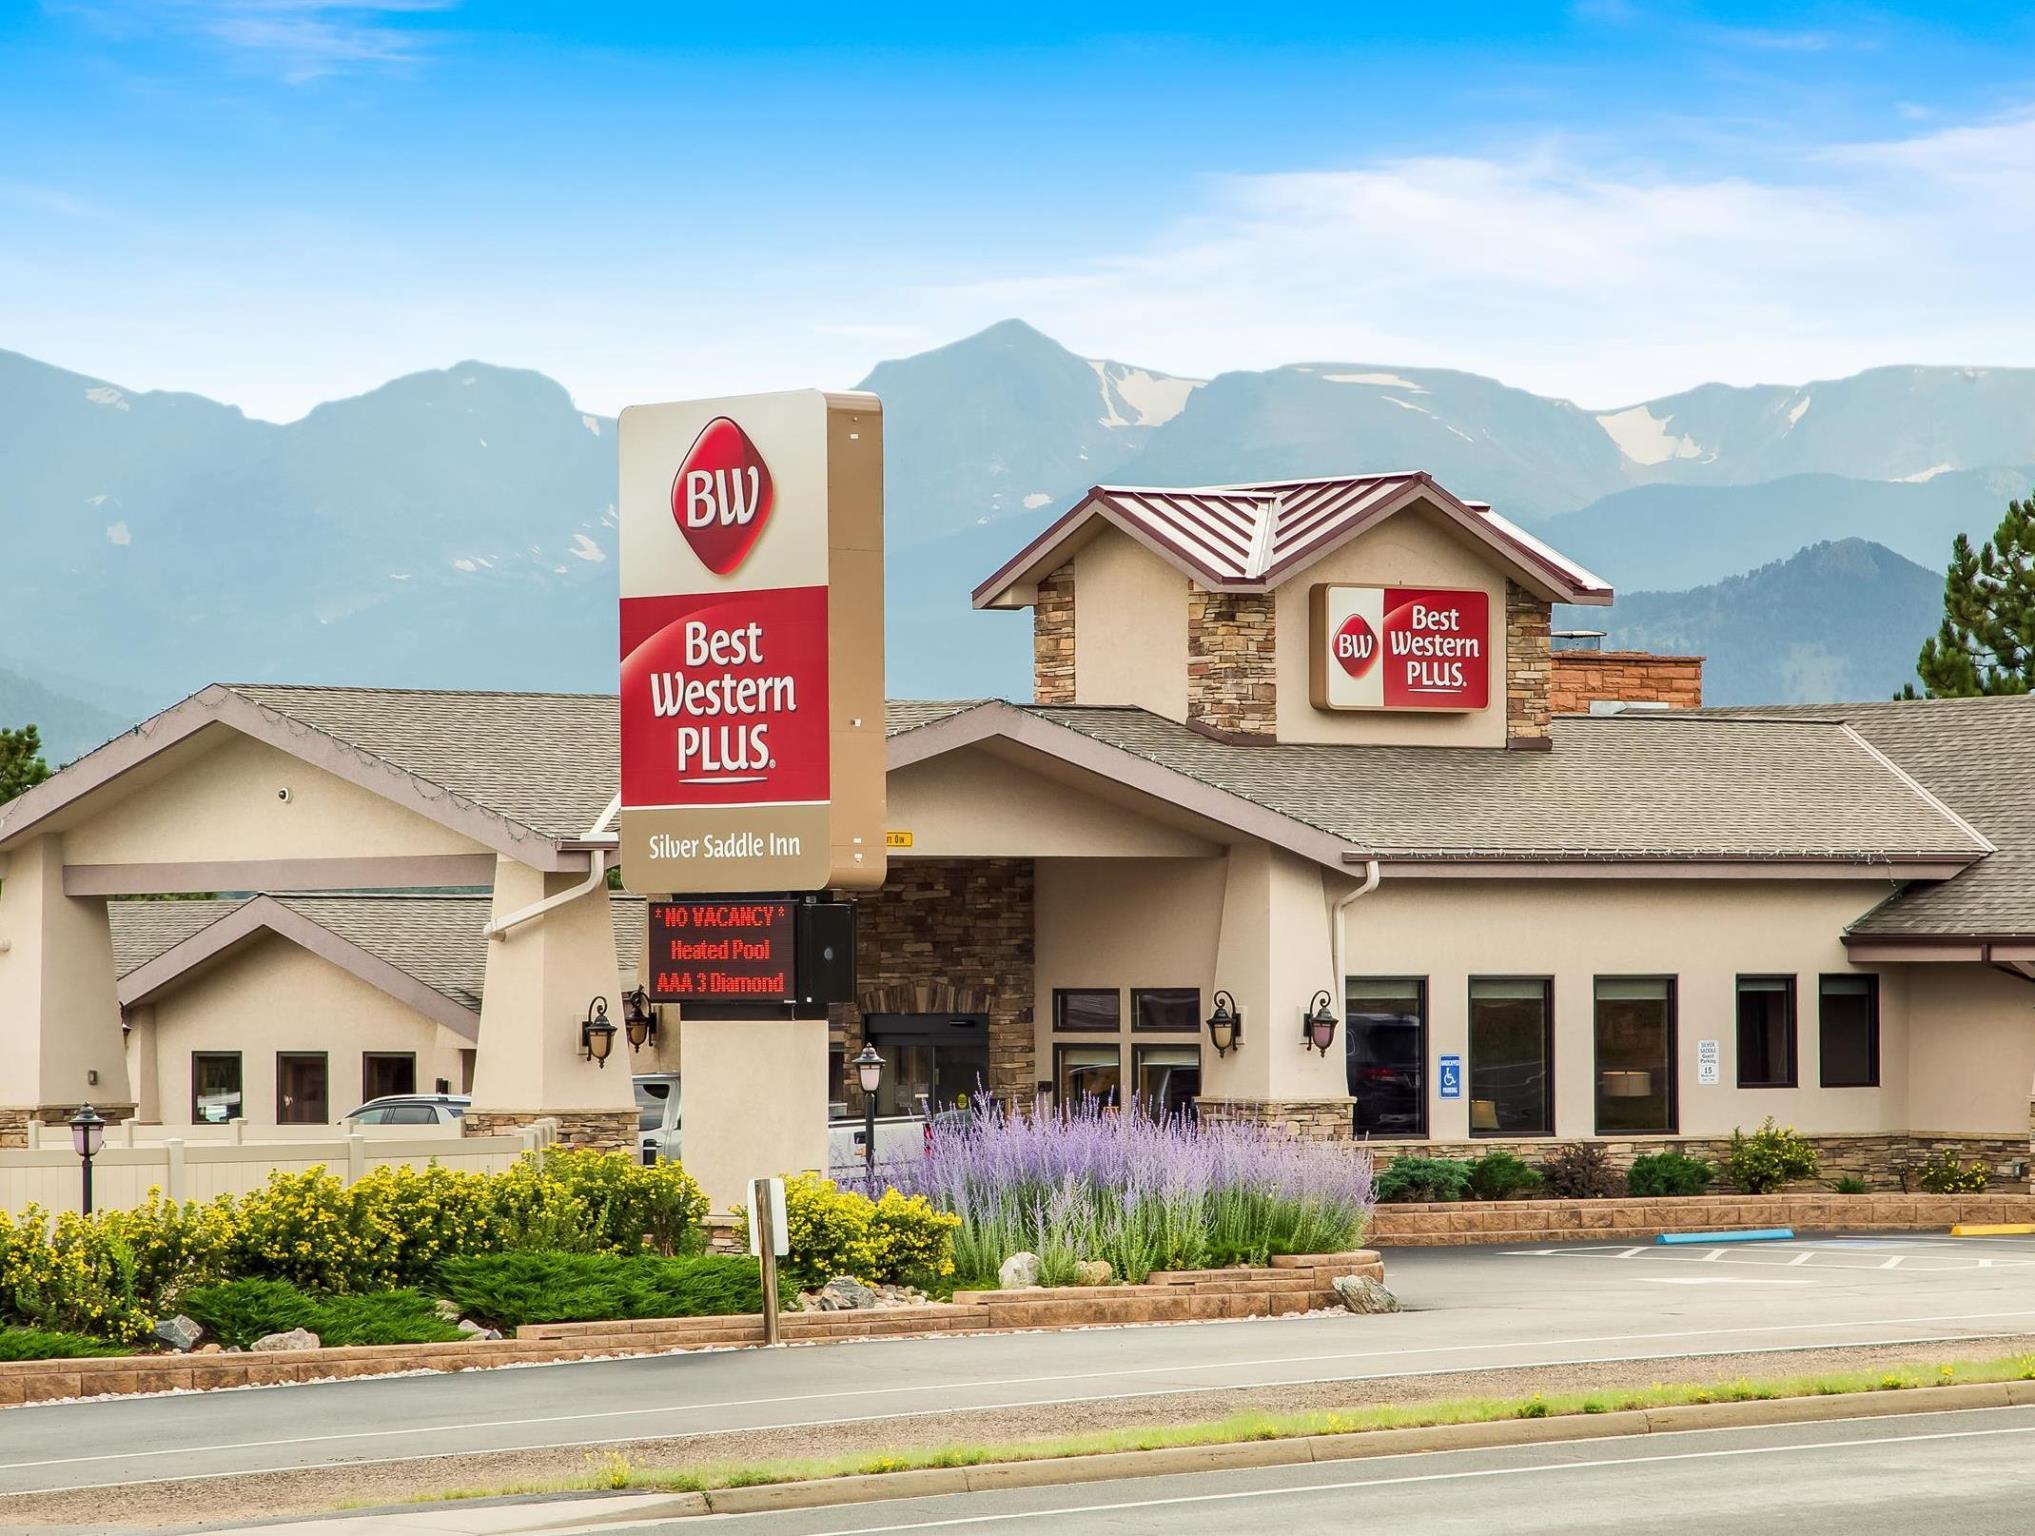 Best Western Plus Silver Saddle Inn